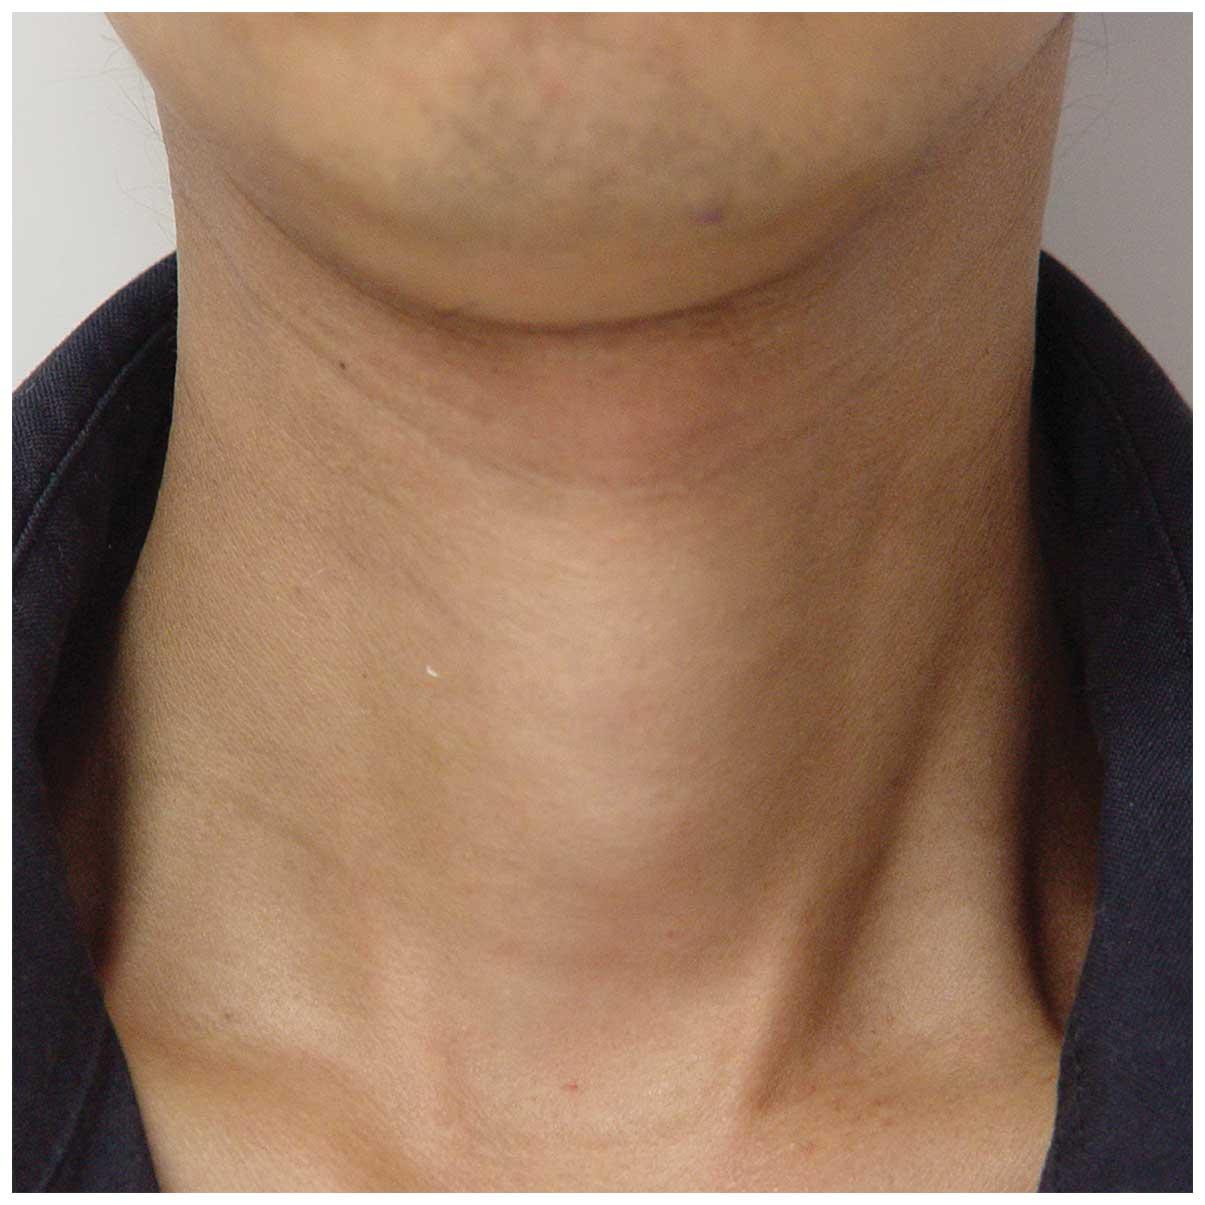 Visible Enlargement Of Thyroid Gland